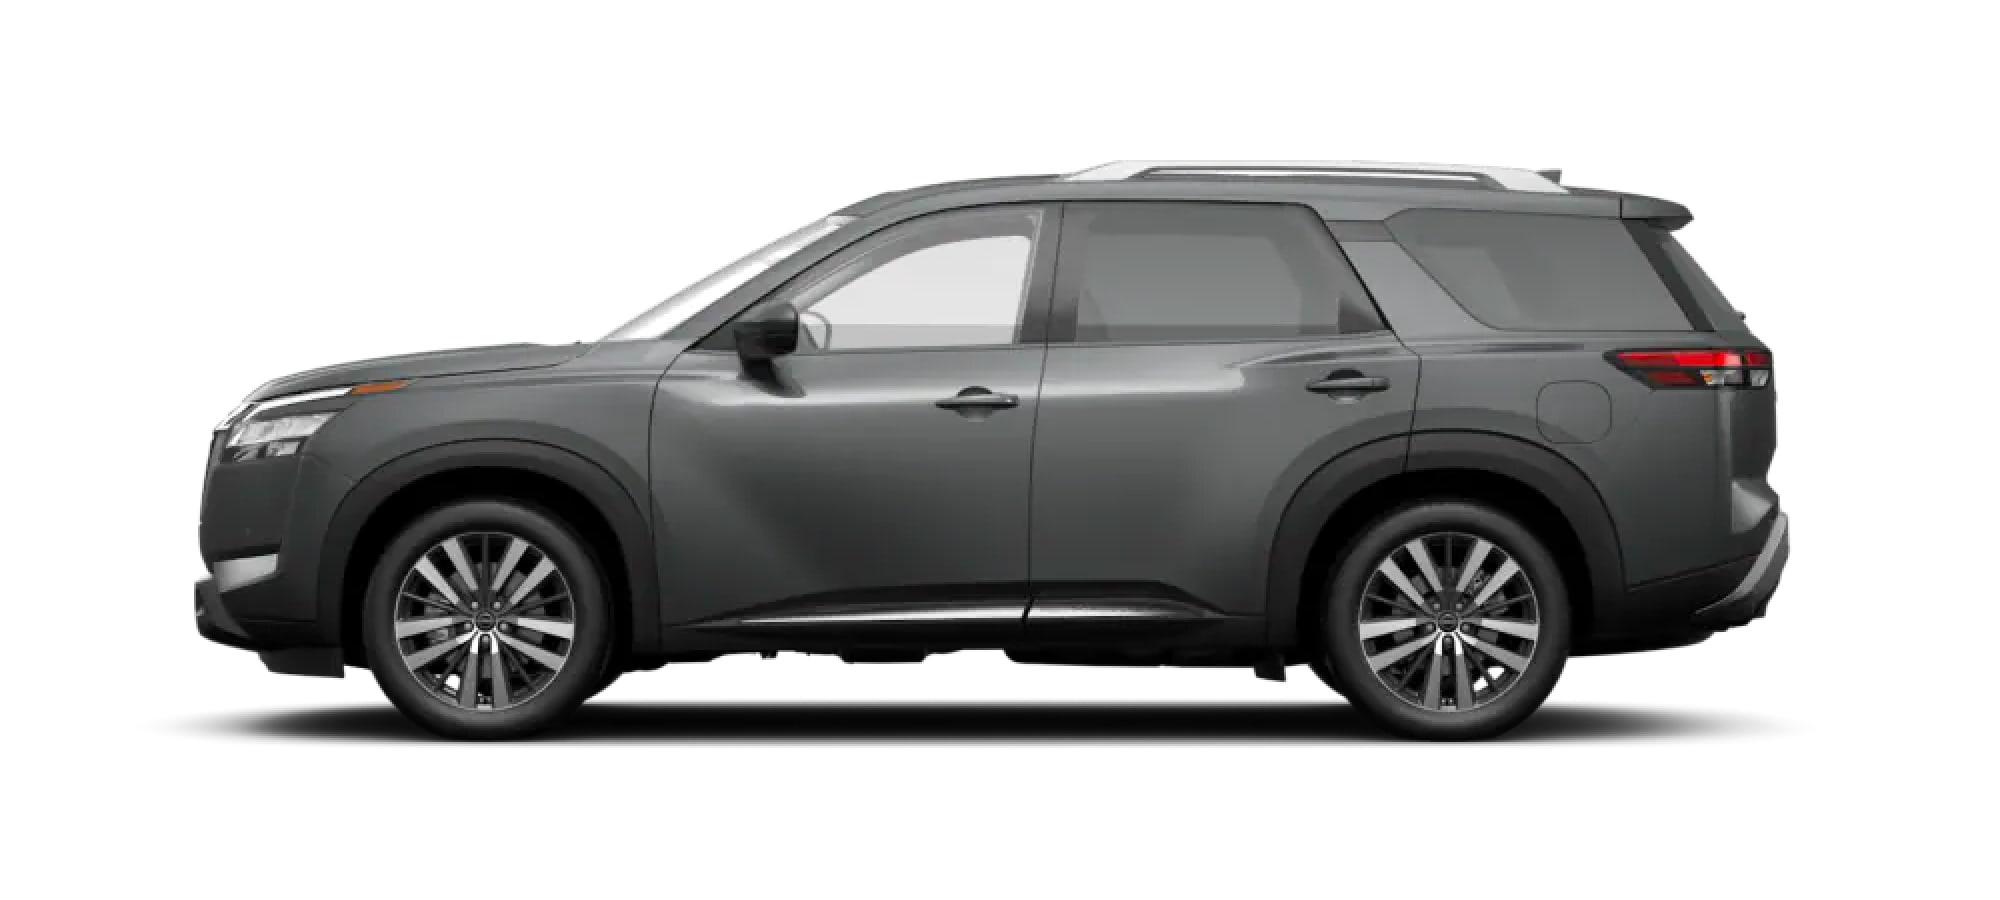 2022 Nissan Pathfinder in Gun Metallic